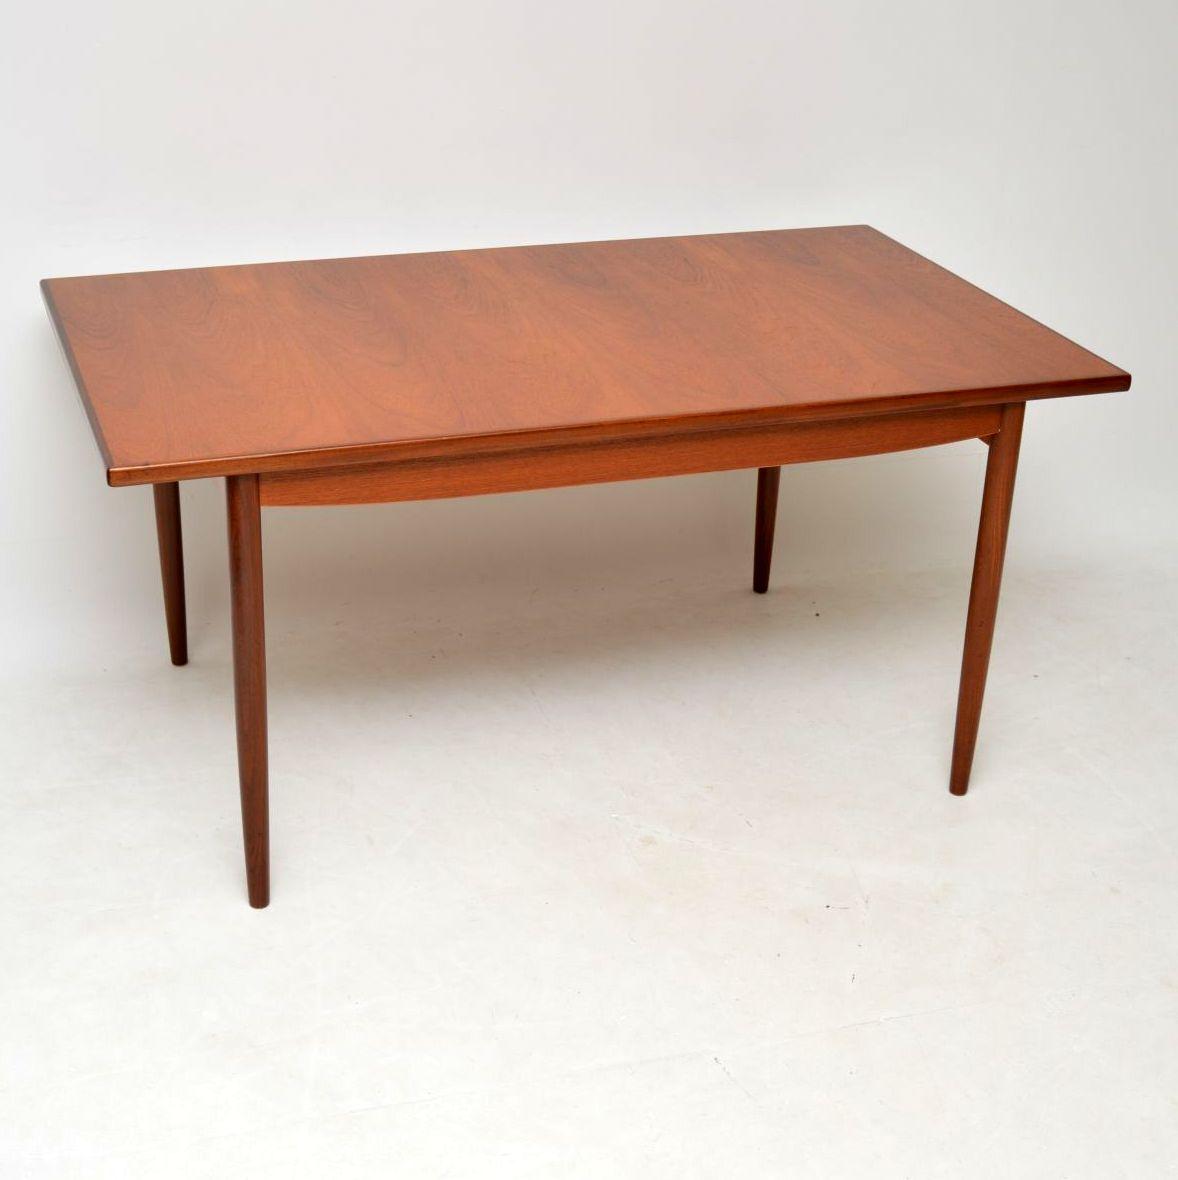 danish_teak_retro_vintage_dining_table_kofod_larsen_1